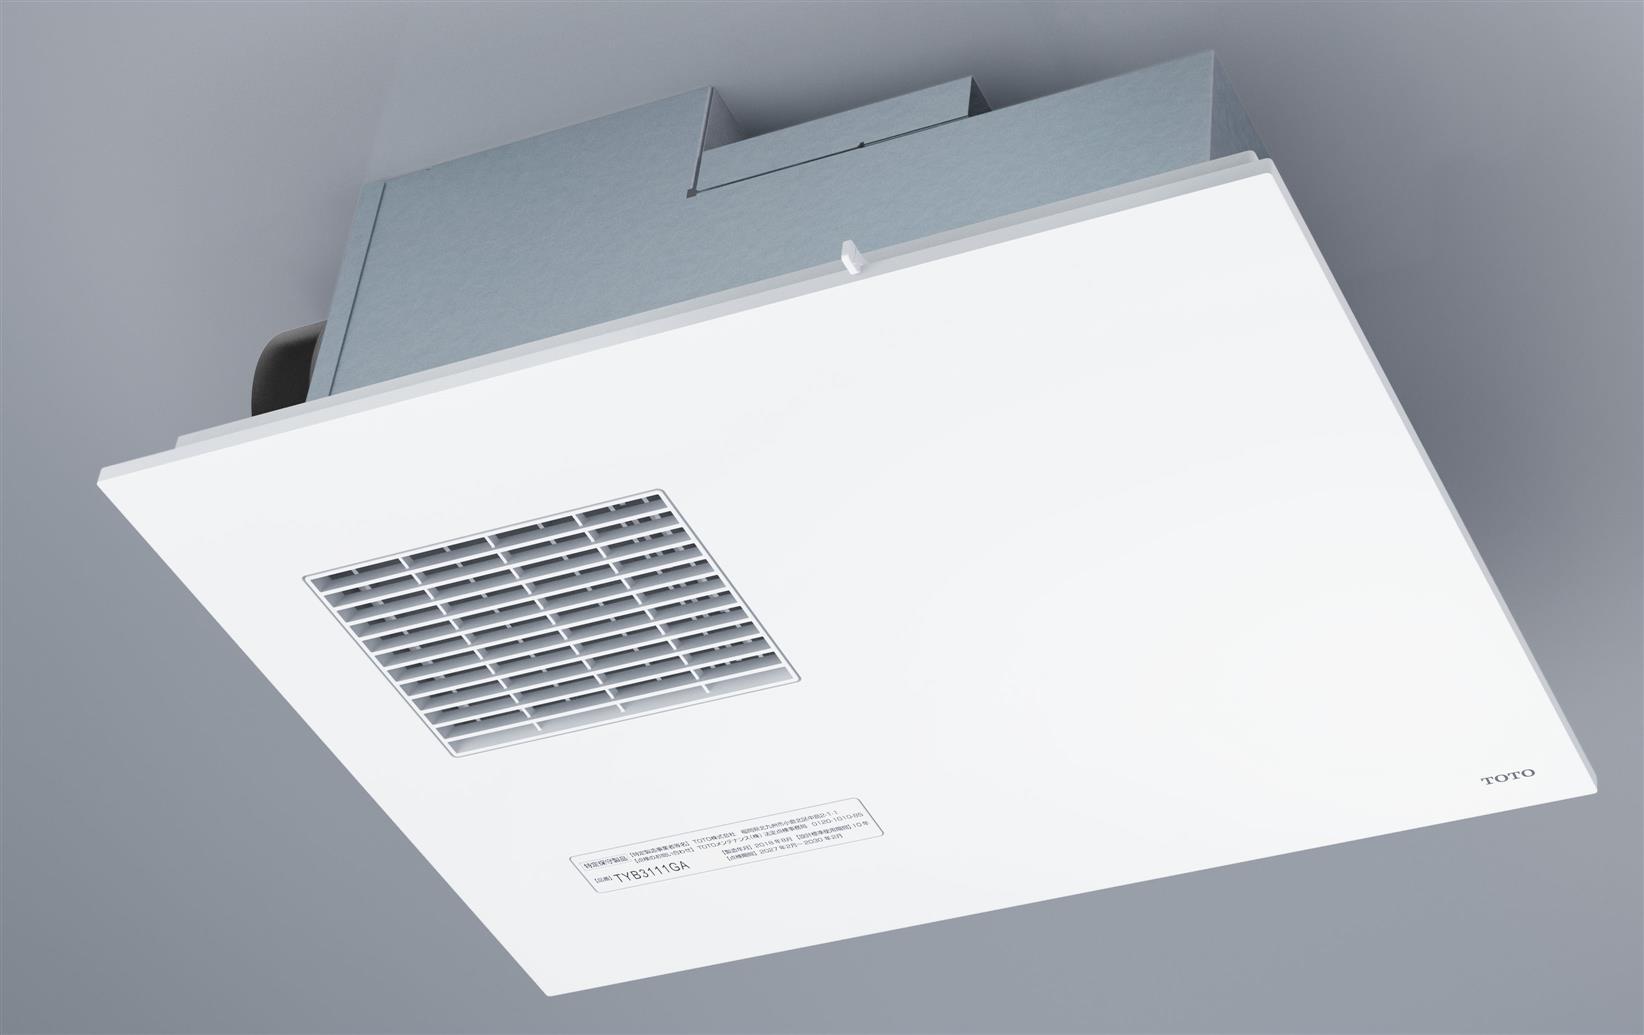 TOTO 浴室換気暖房乾燥機「三乾王」 1室換気タイプ(100V) TYB3111GA